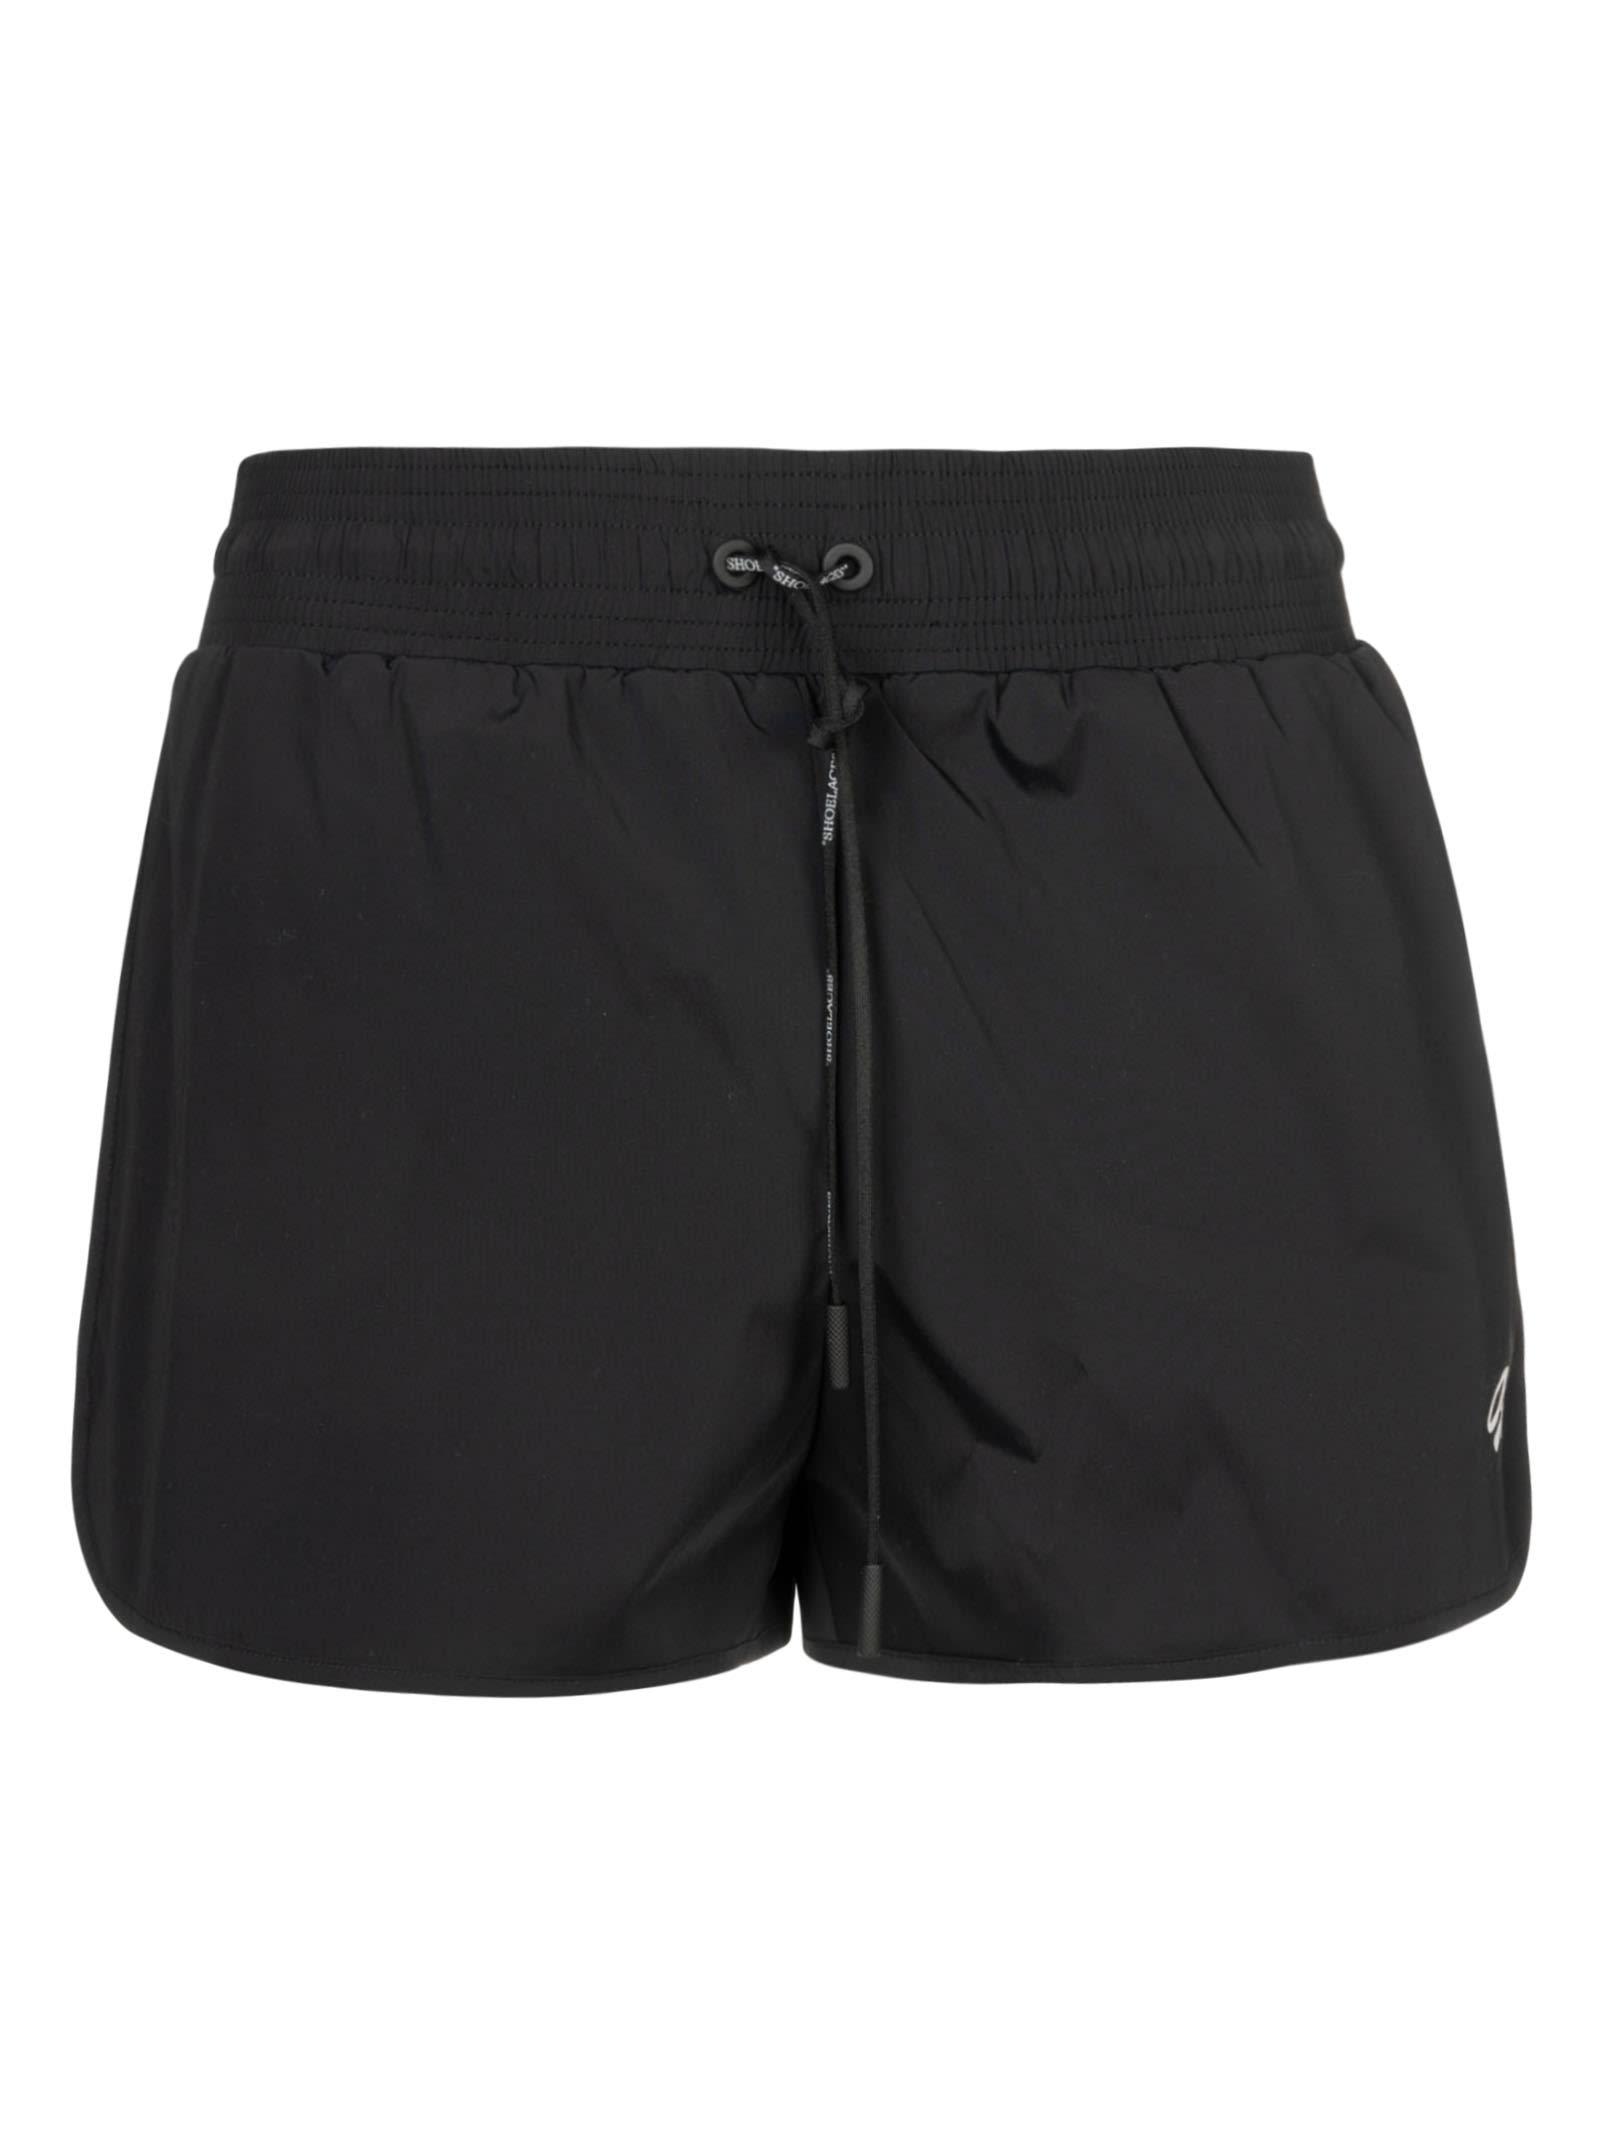 Off-White Athleisure Woven Shorts